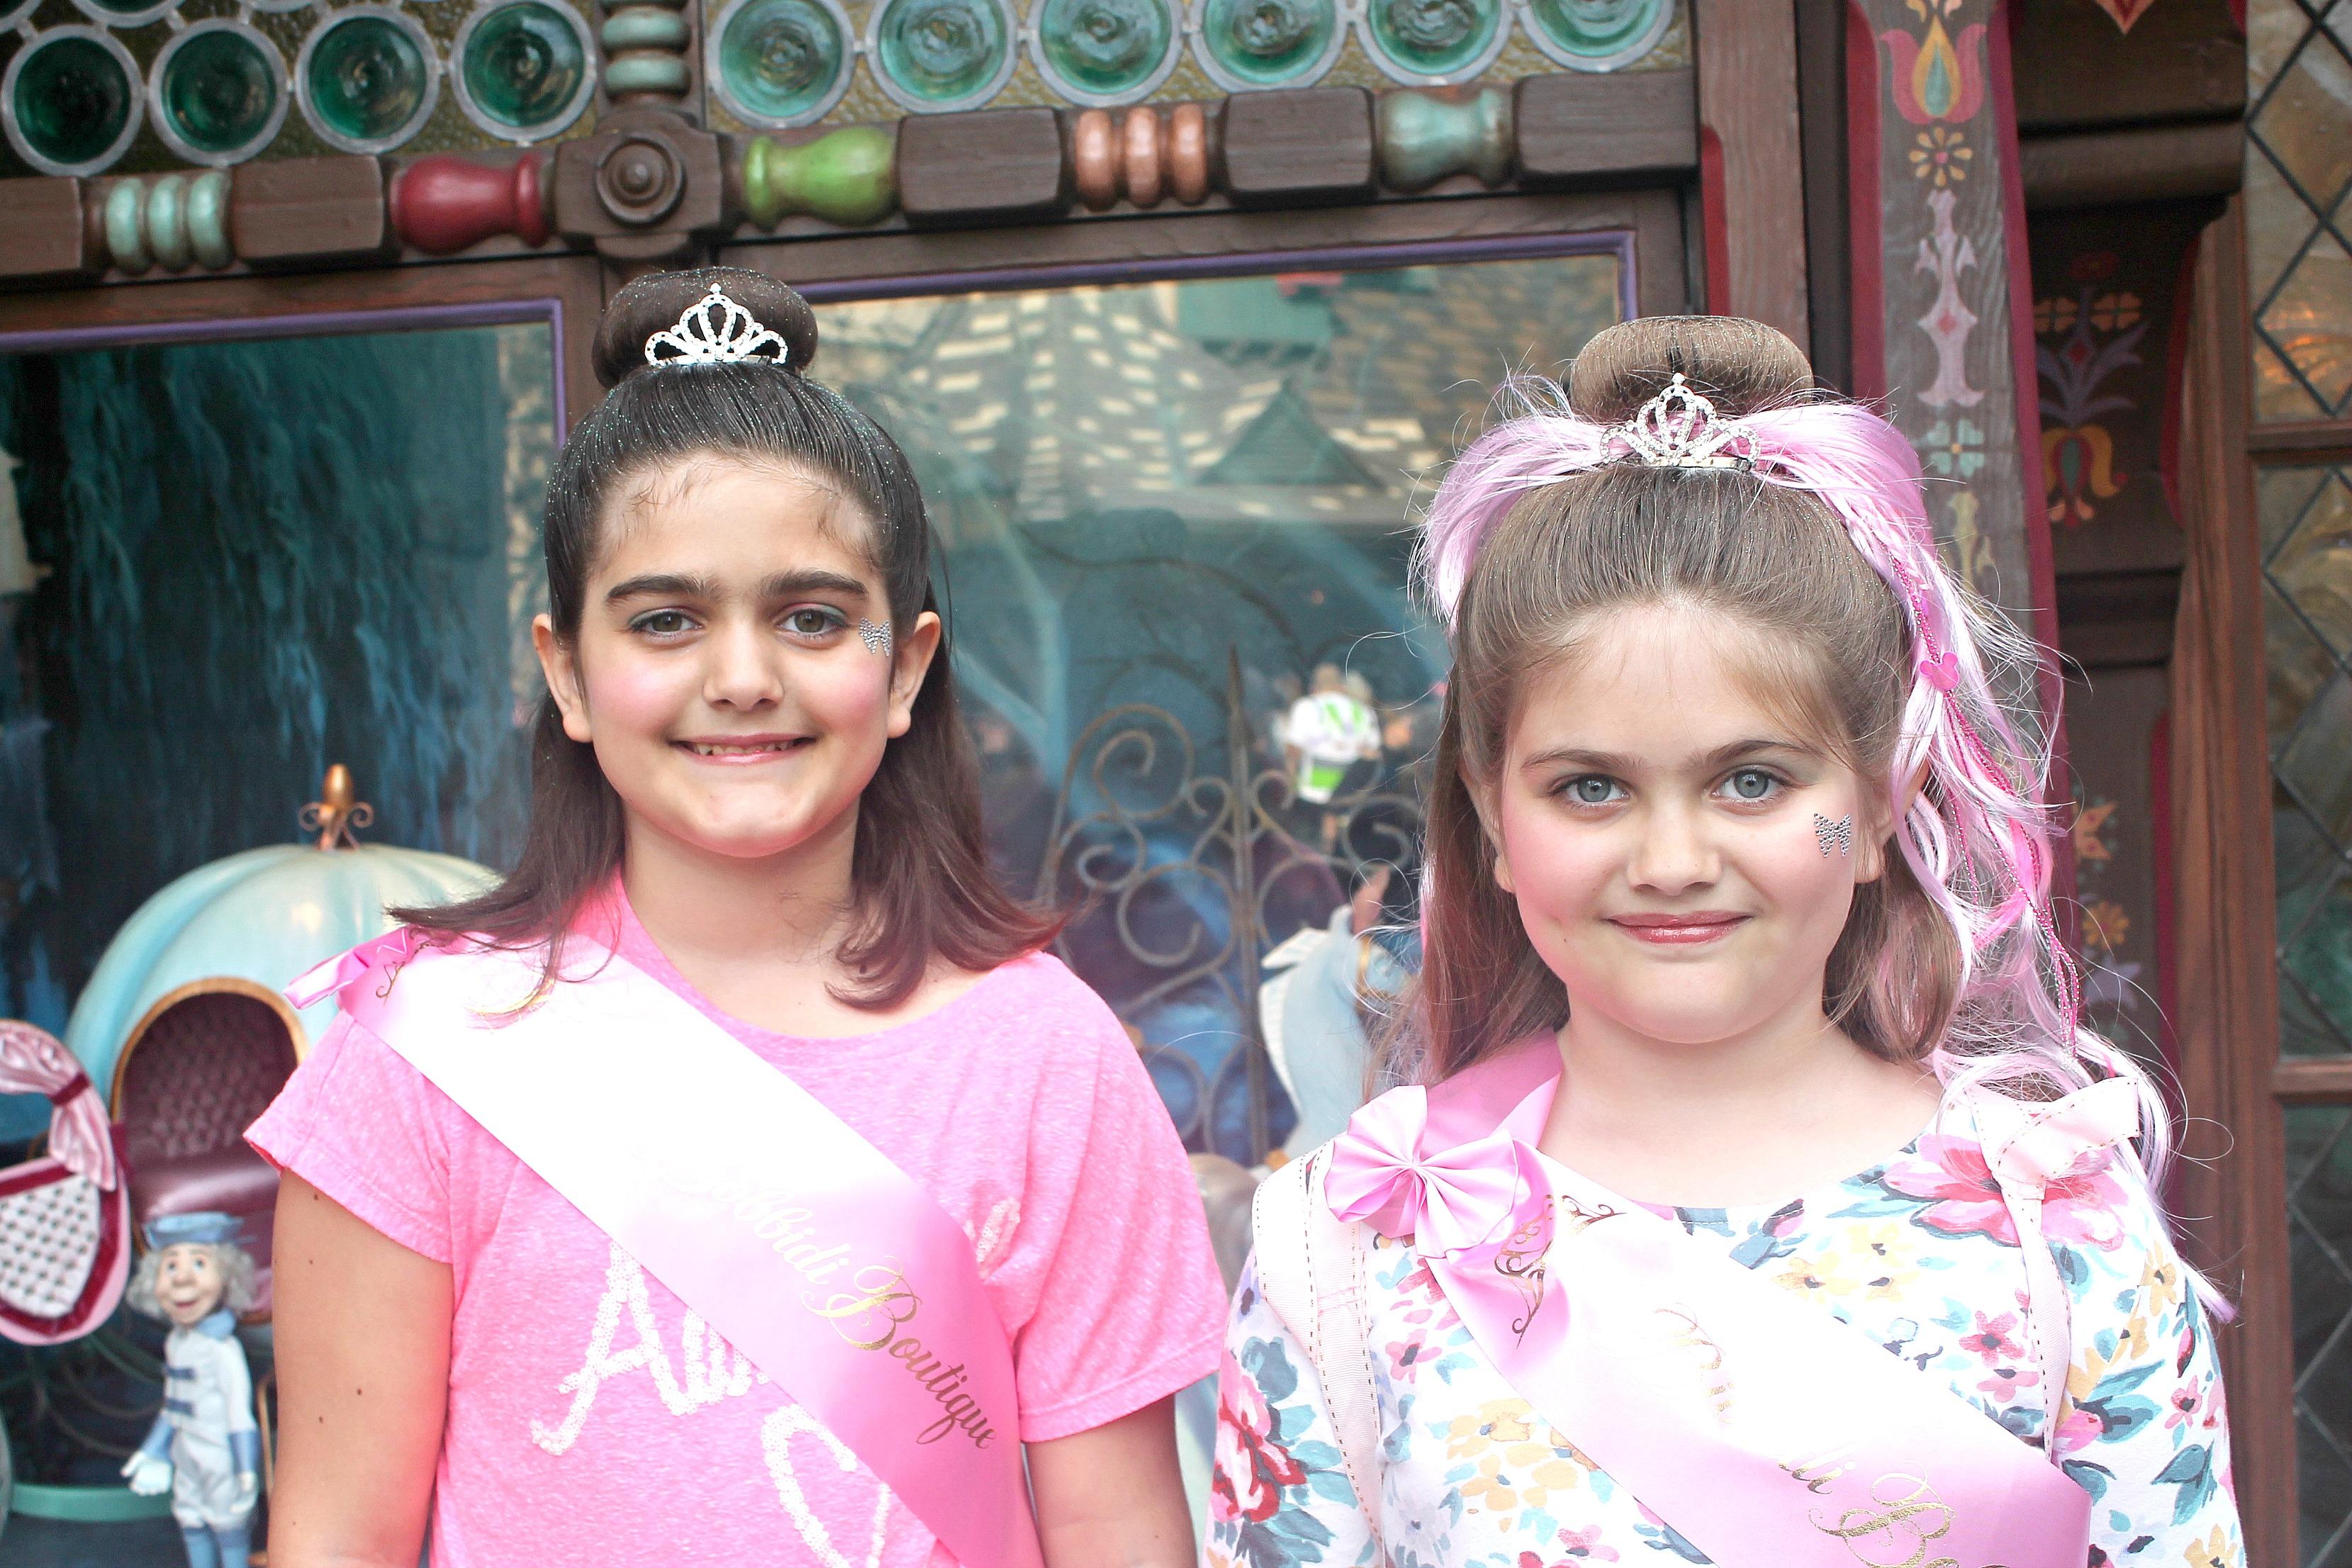 Treat your little princess to a magical transformation at Bibbidi Bobbidi Boutique at the Disneyland Resort.